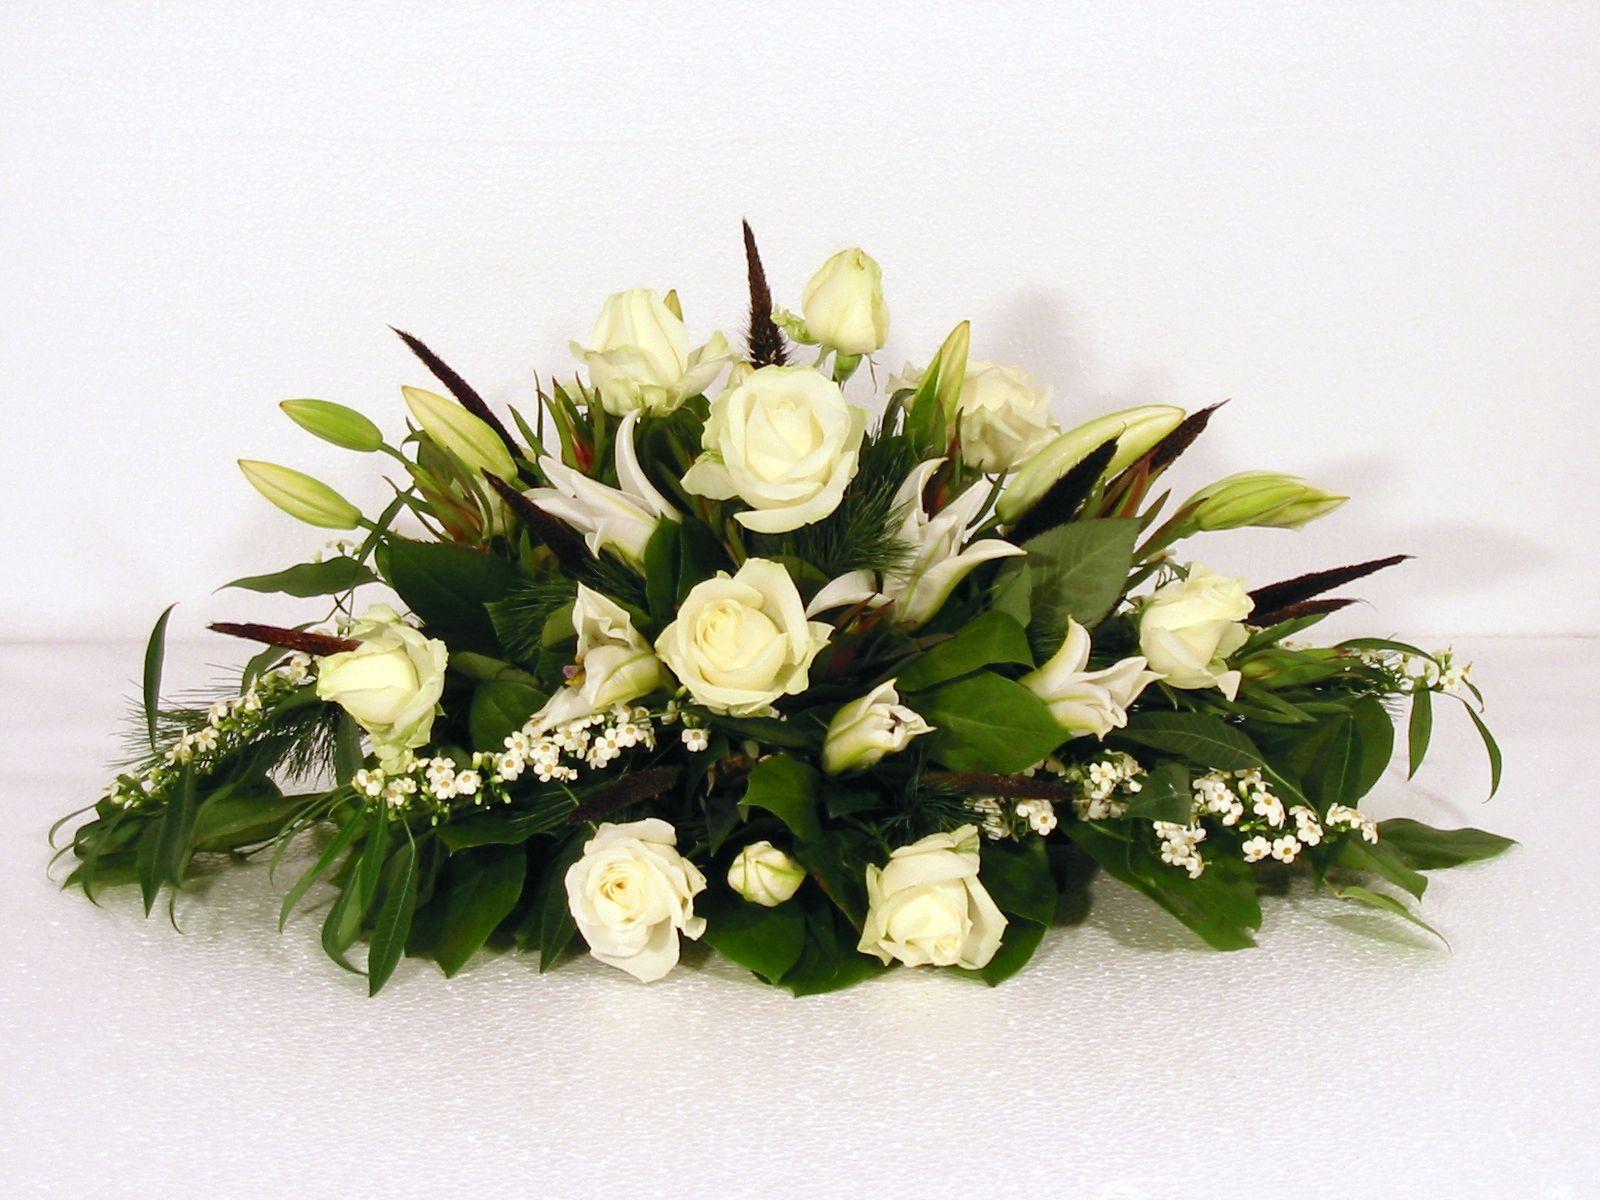 Fiori Retro Macchina #Fiori #Flowers